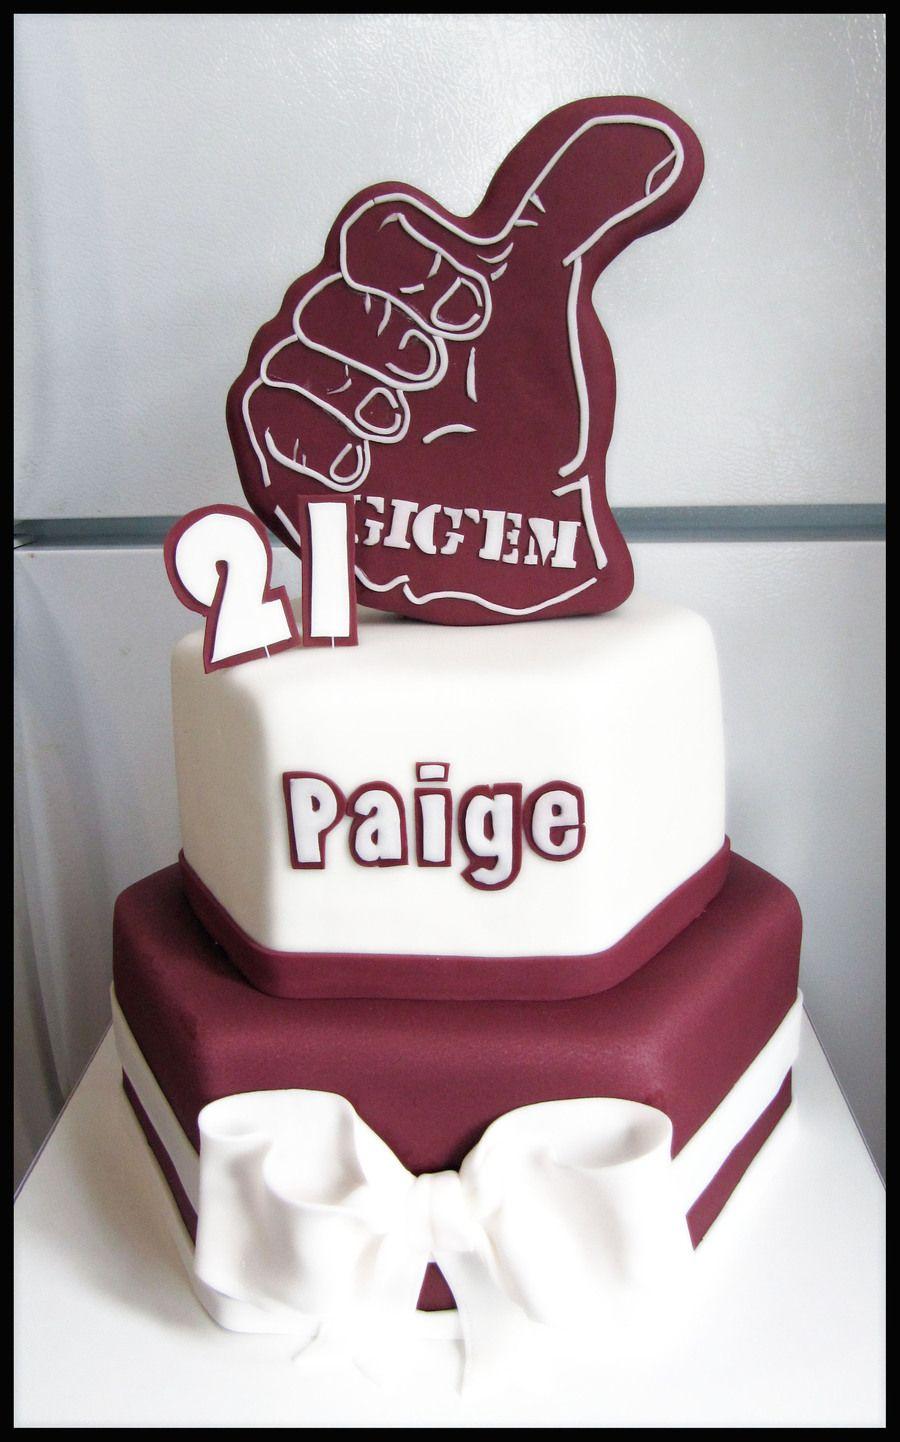 Aggie 21St Birthday 21st birthday cakes, 21st birthday